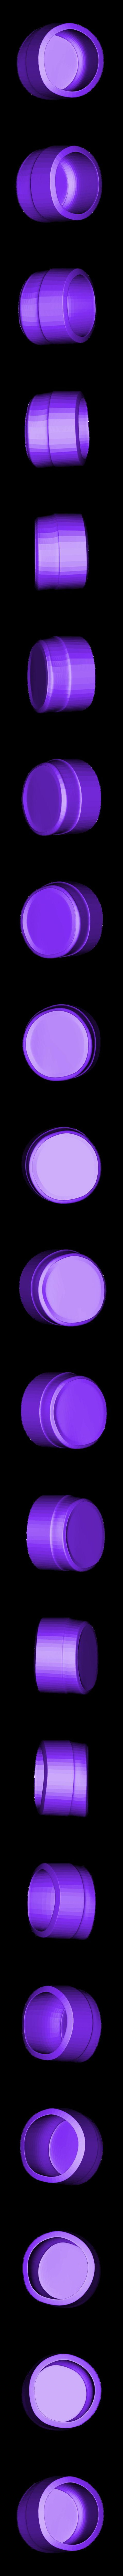 Lucio_hoseMntD_lft.stl Download free STL file Overwatch Lucio Blaster • 3D printer object, Adafruit